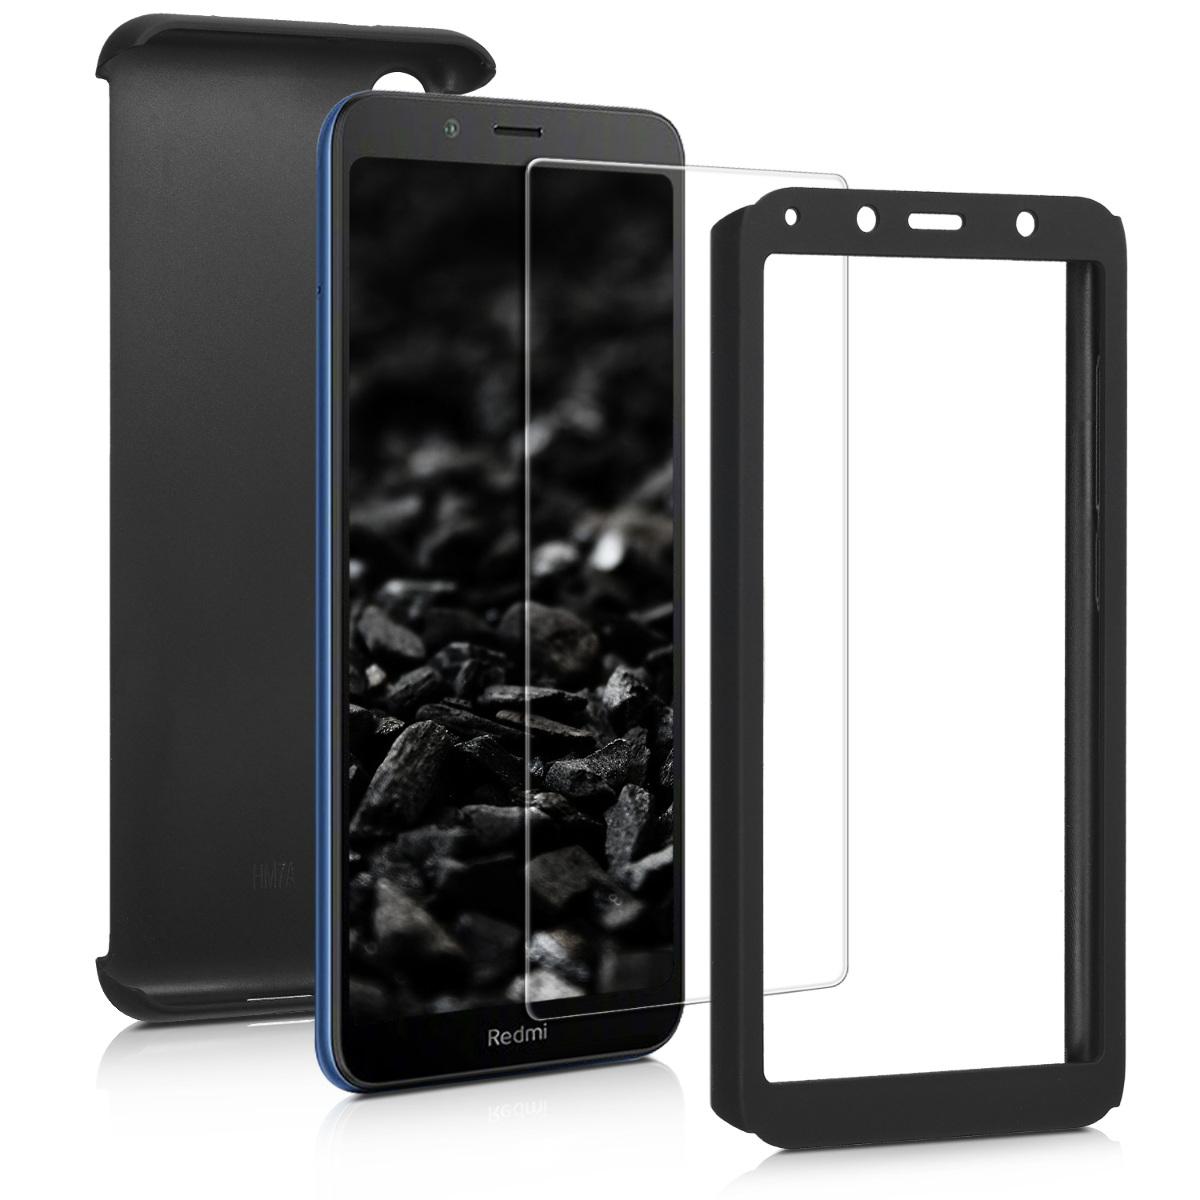 KW Θήκη Full Body Xiaomi Redmi 7A & Tempered Glass - Metallic Black (49234.68)